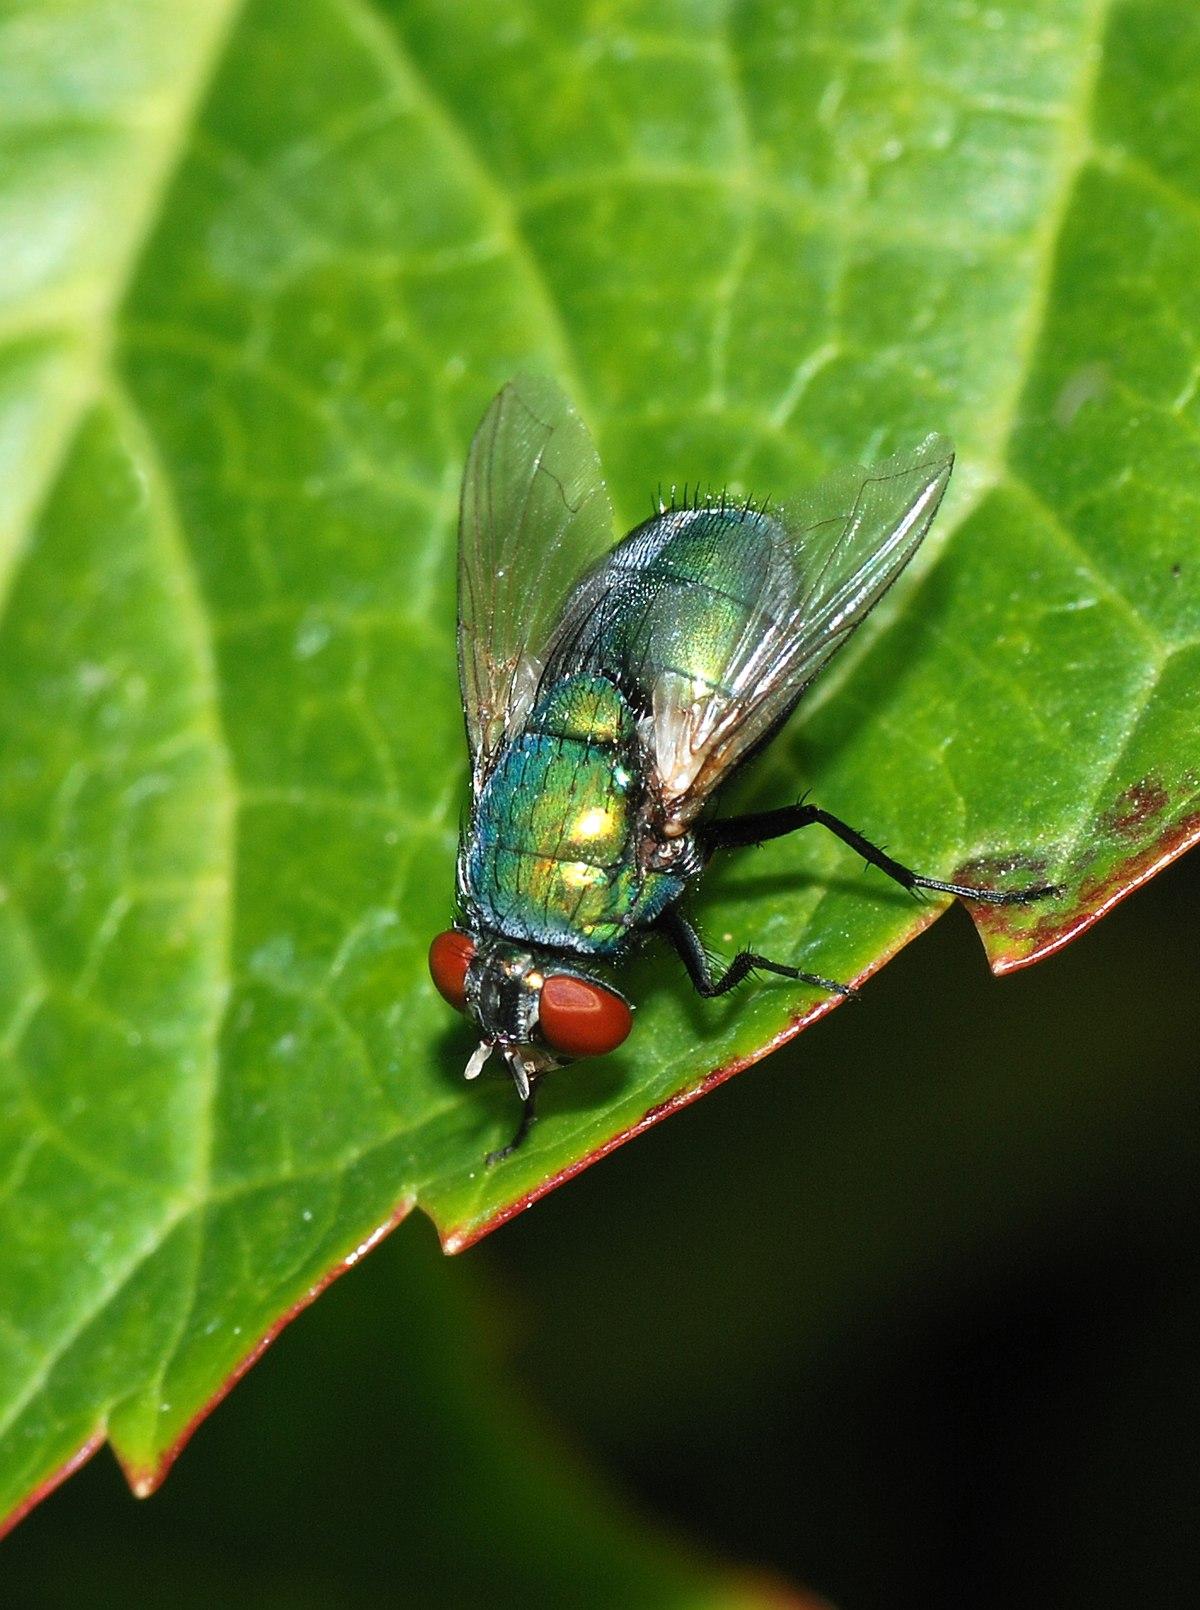 Lucilia sericata wikip dia - Comment trouver un nid de mouche ...